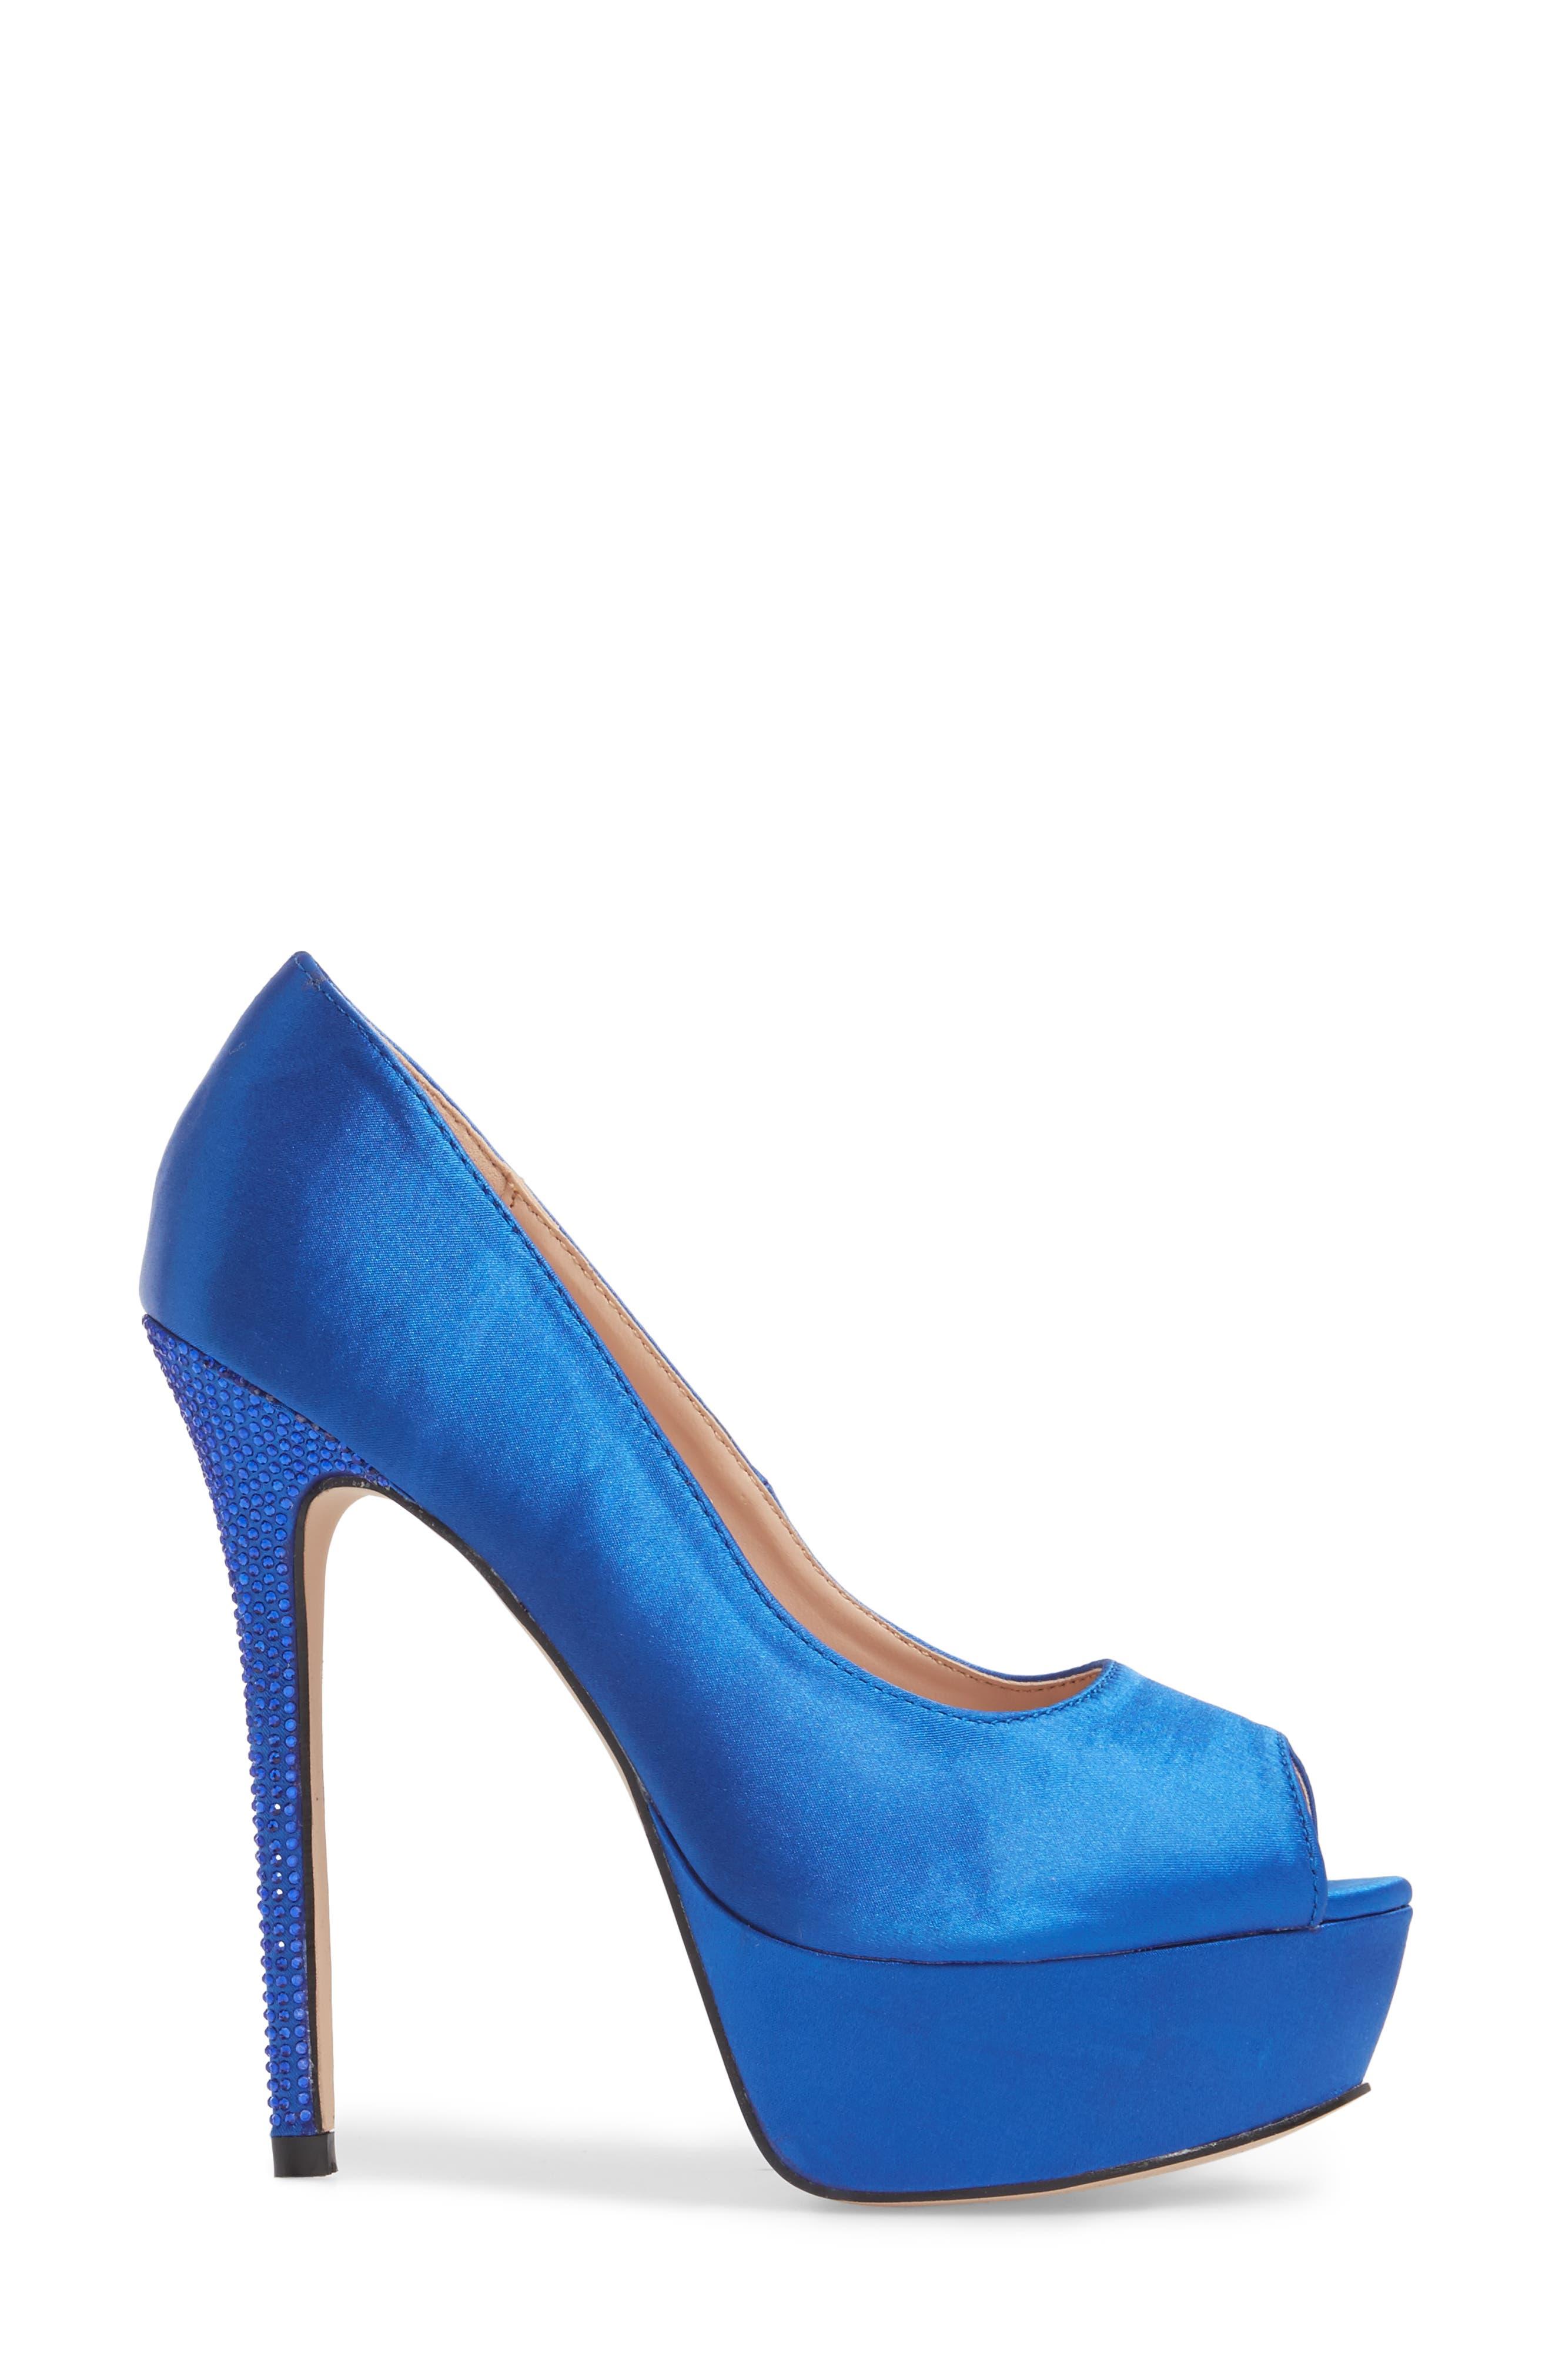 Peep Toe Platform Pump,                             Alternate thumbnail 3, color,                             ROYAL BLUE SATIN